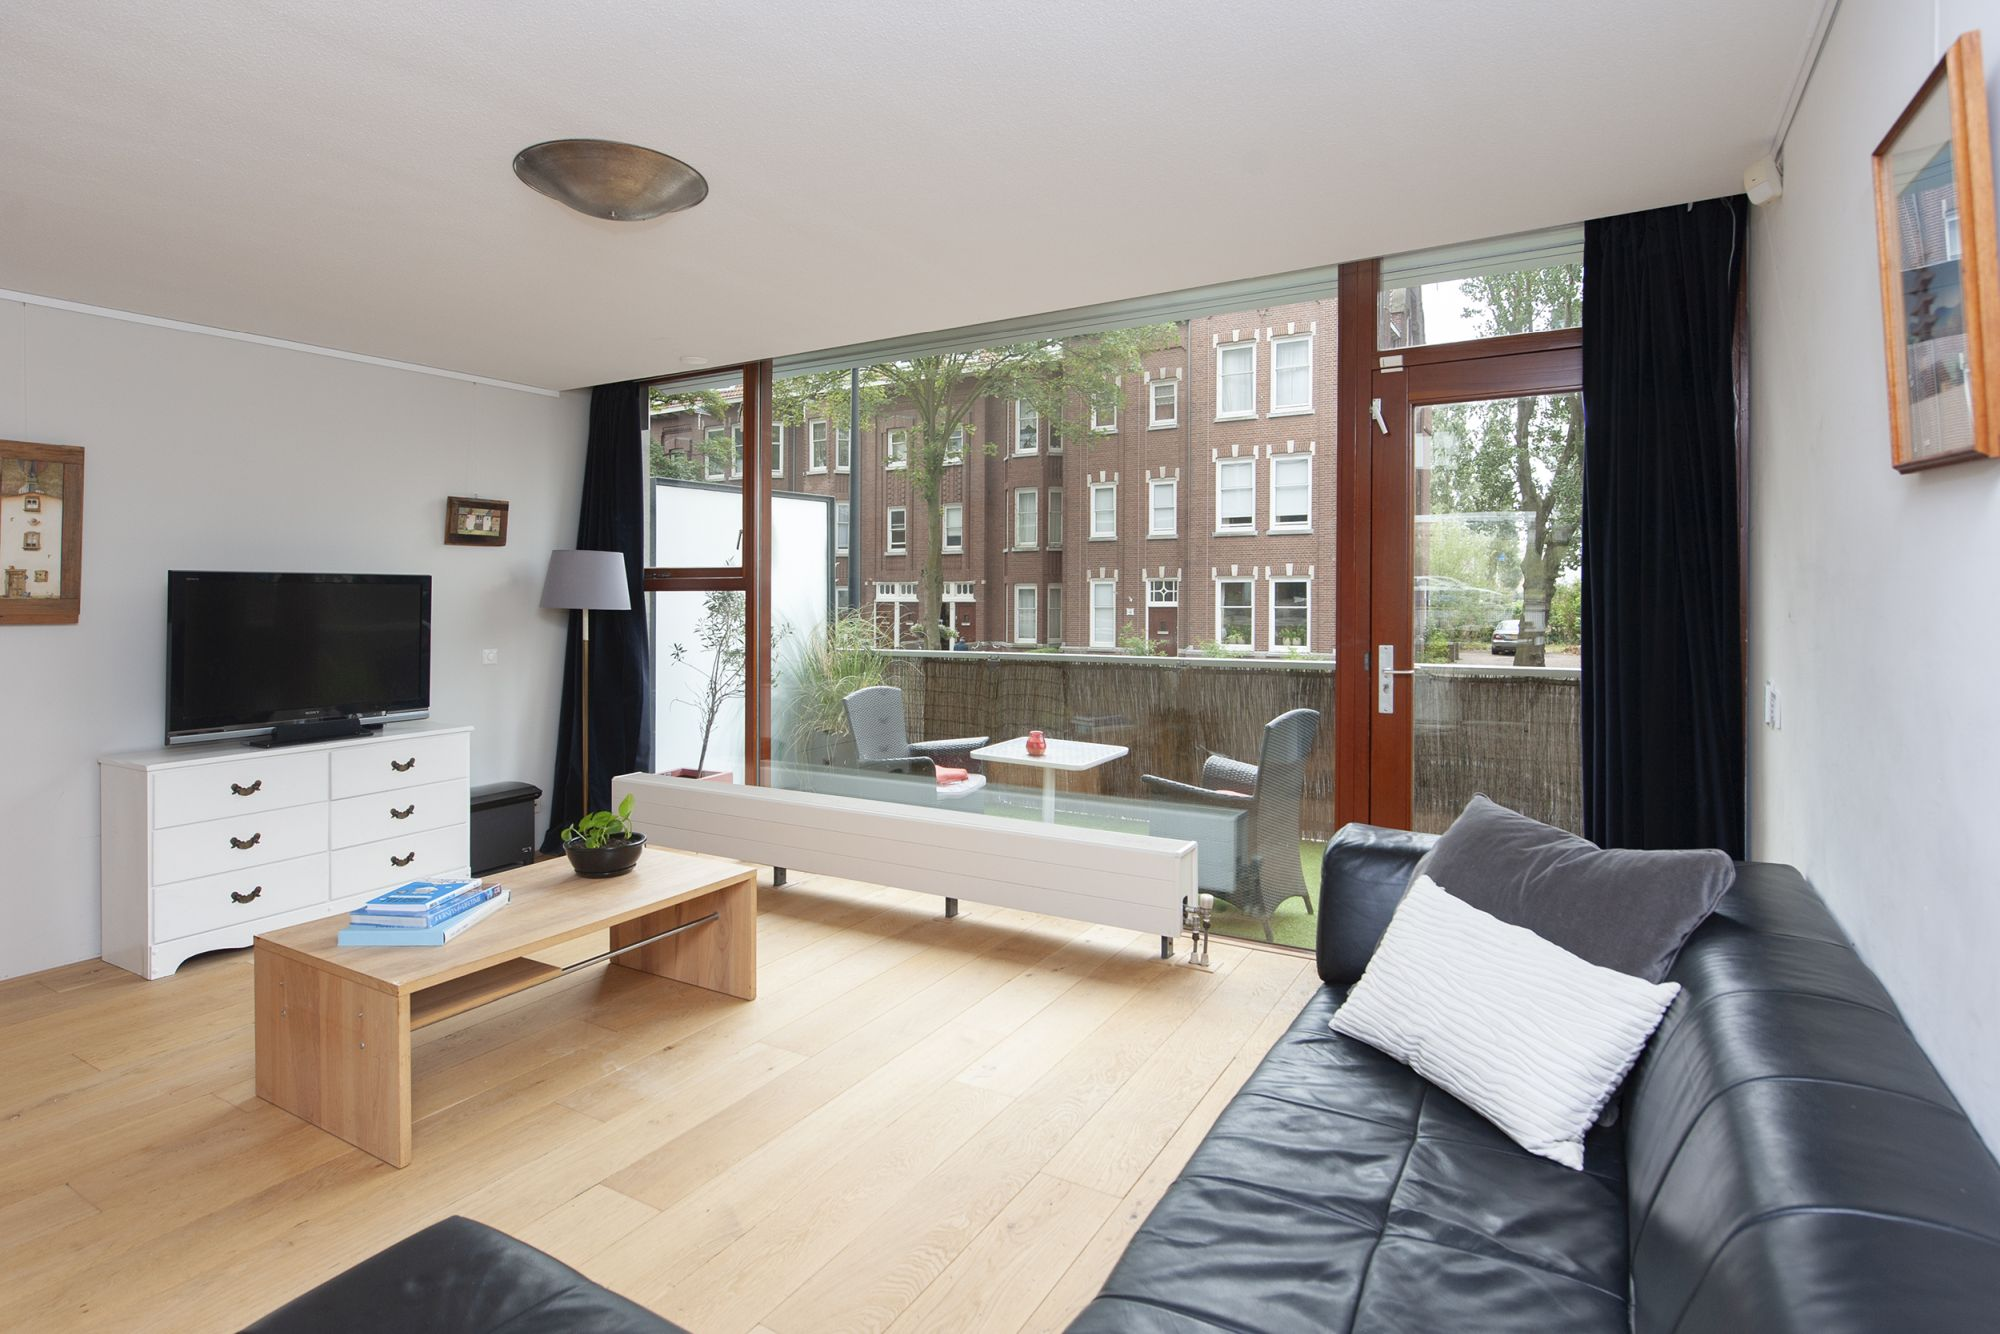 Veemkade, Amsterdam